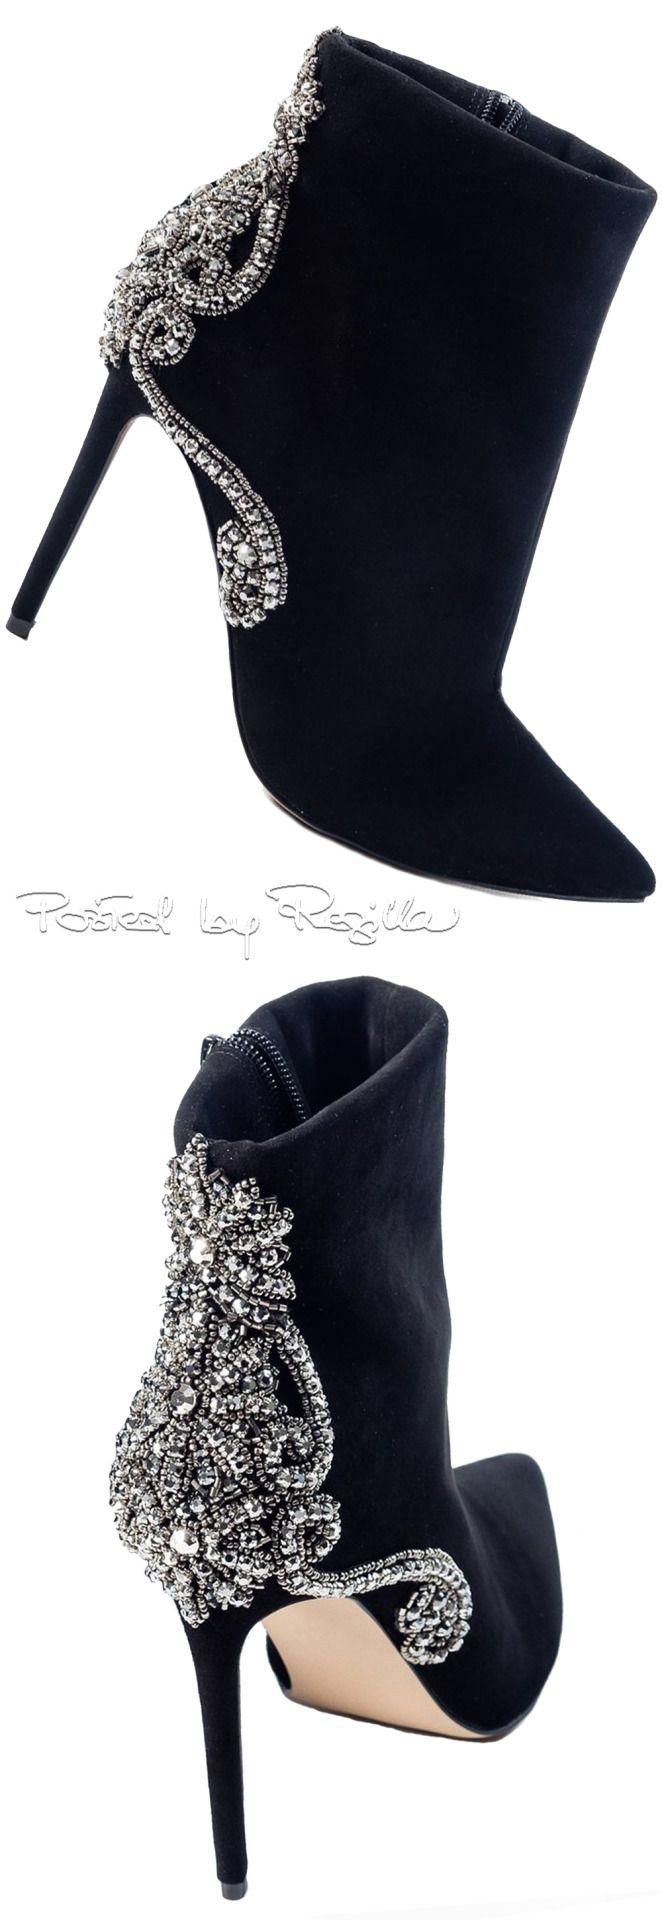 Regilla  Aminah Abdul Jillil  Black and Silver  Pinterest  Shoe